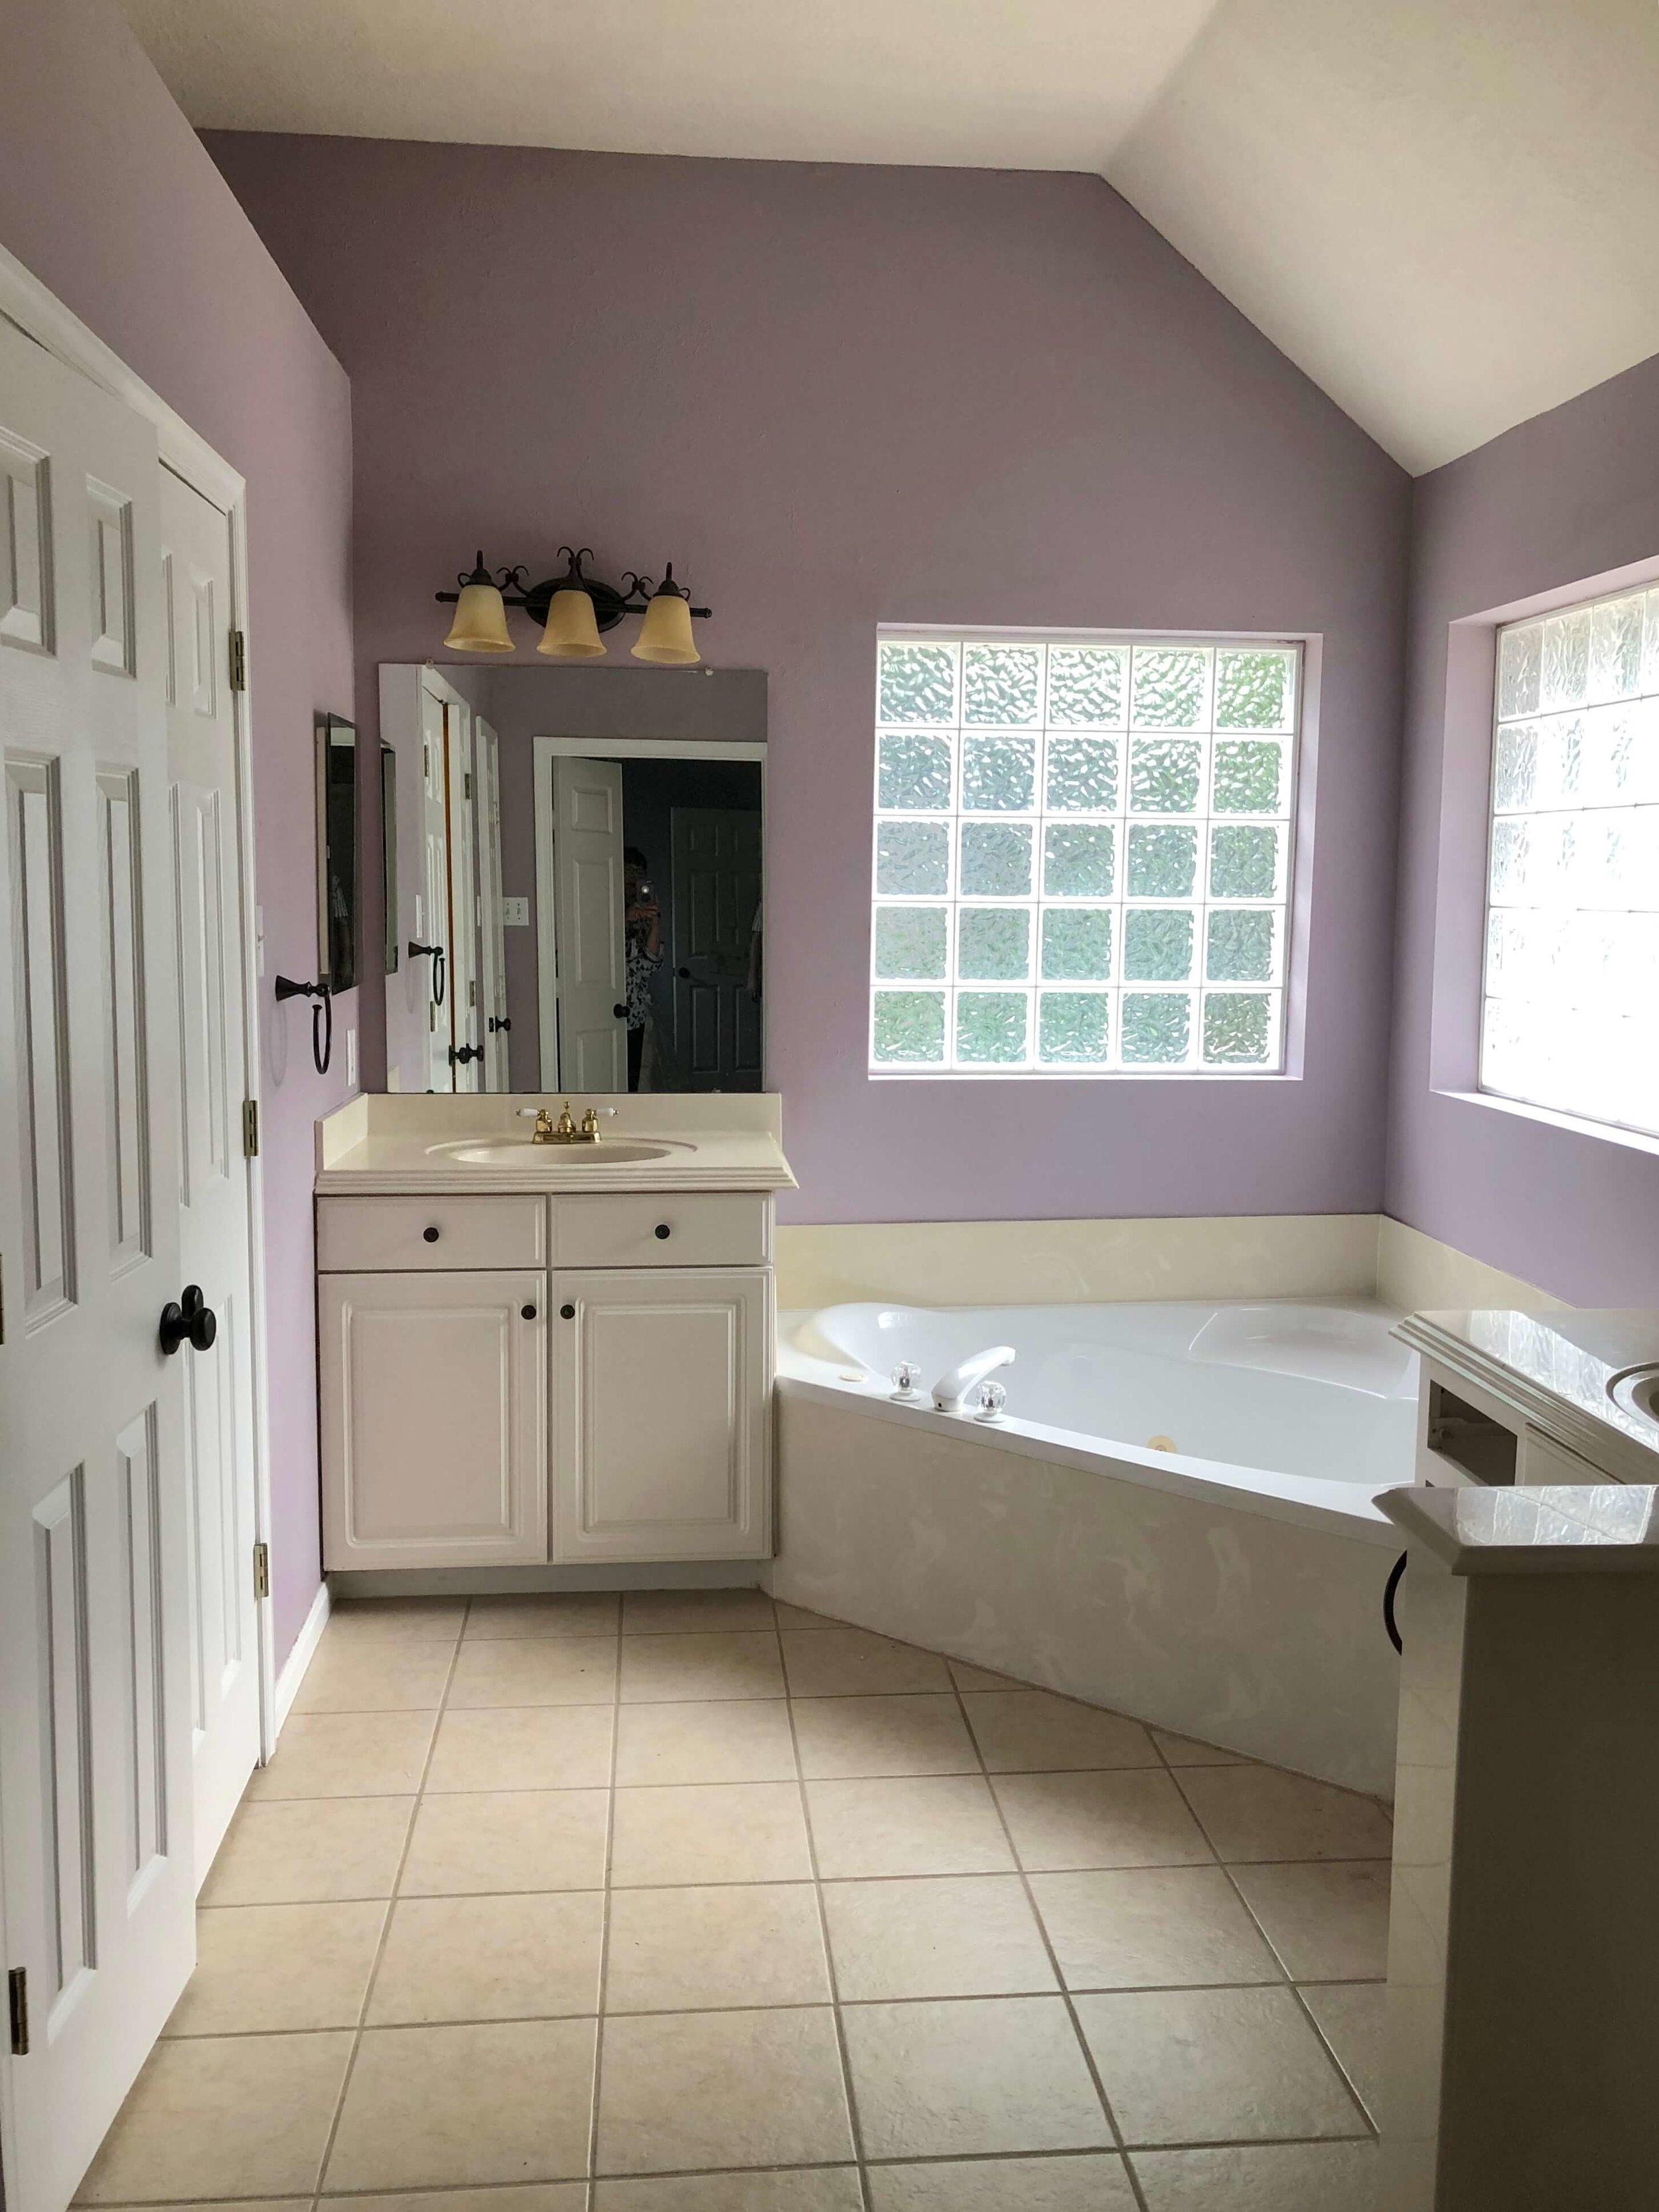 BEFORE - Bathroom remodel with corner tub